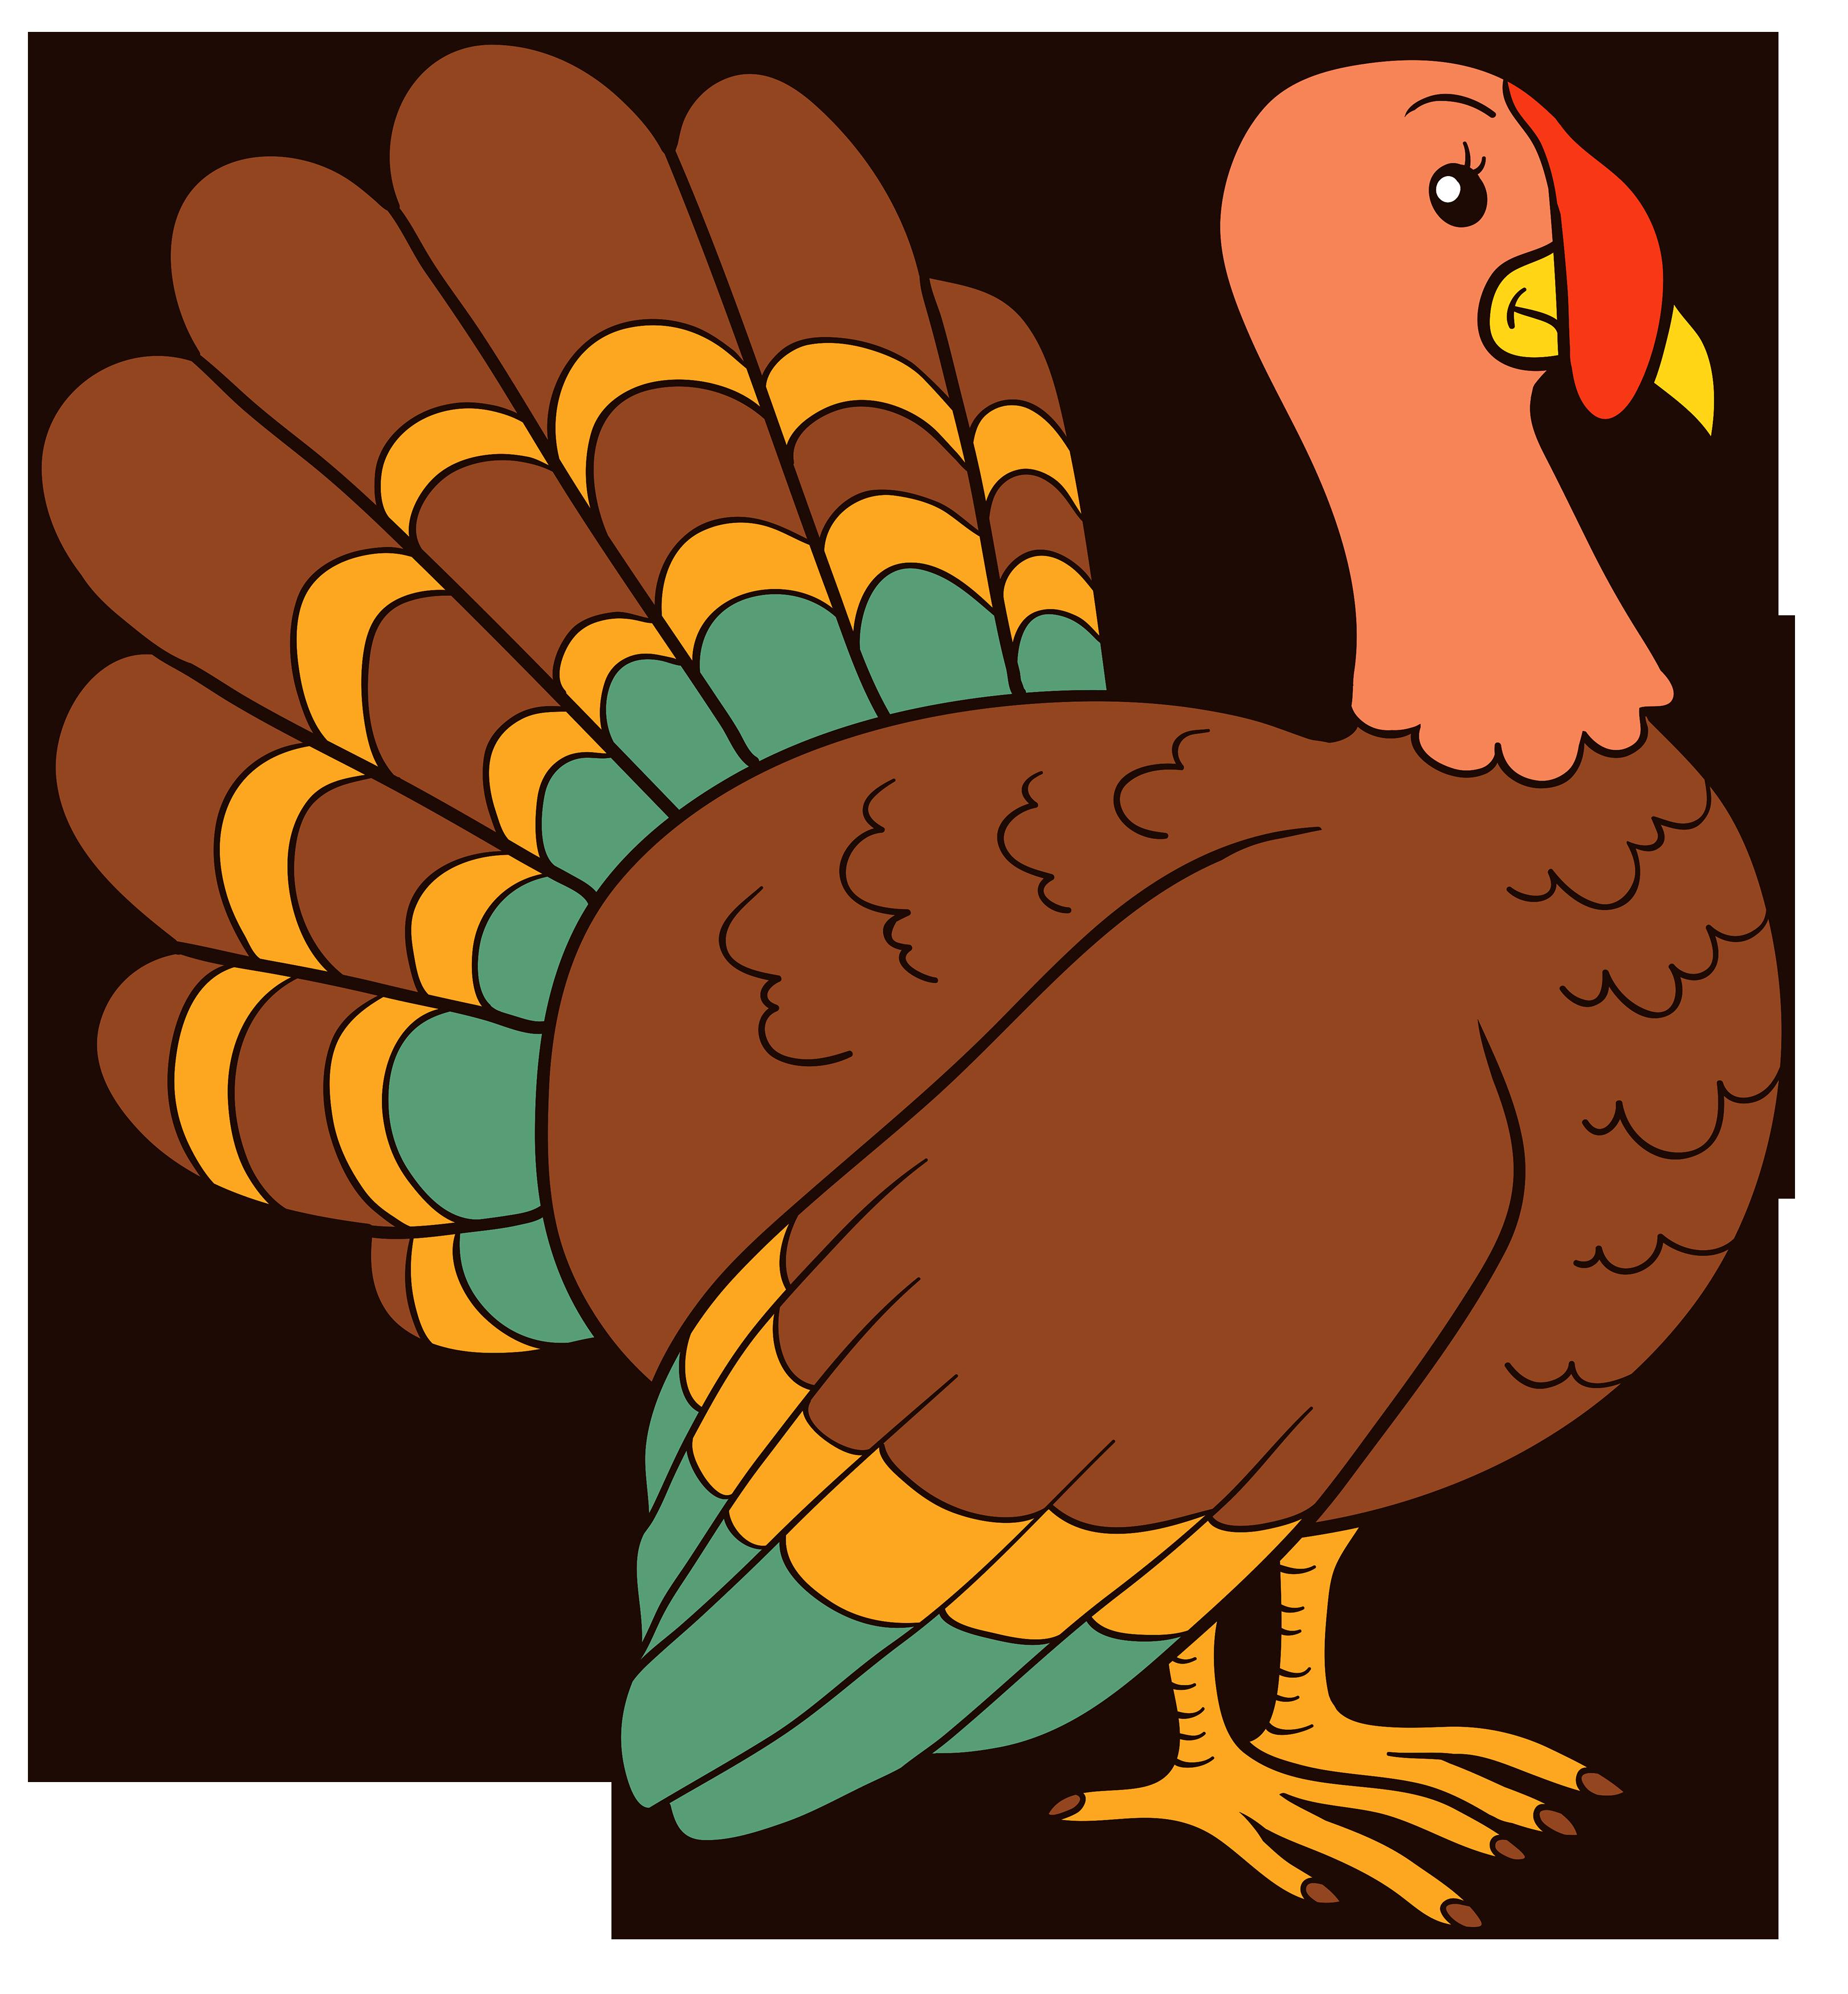 Turkey Clip Art - Vergilis Clipart .-Turkey clip art - Vergilis Clipart .-16